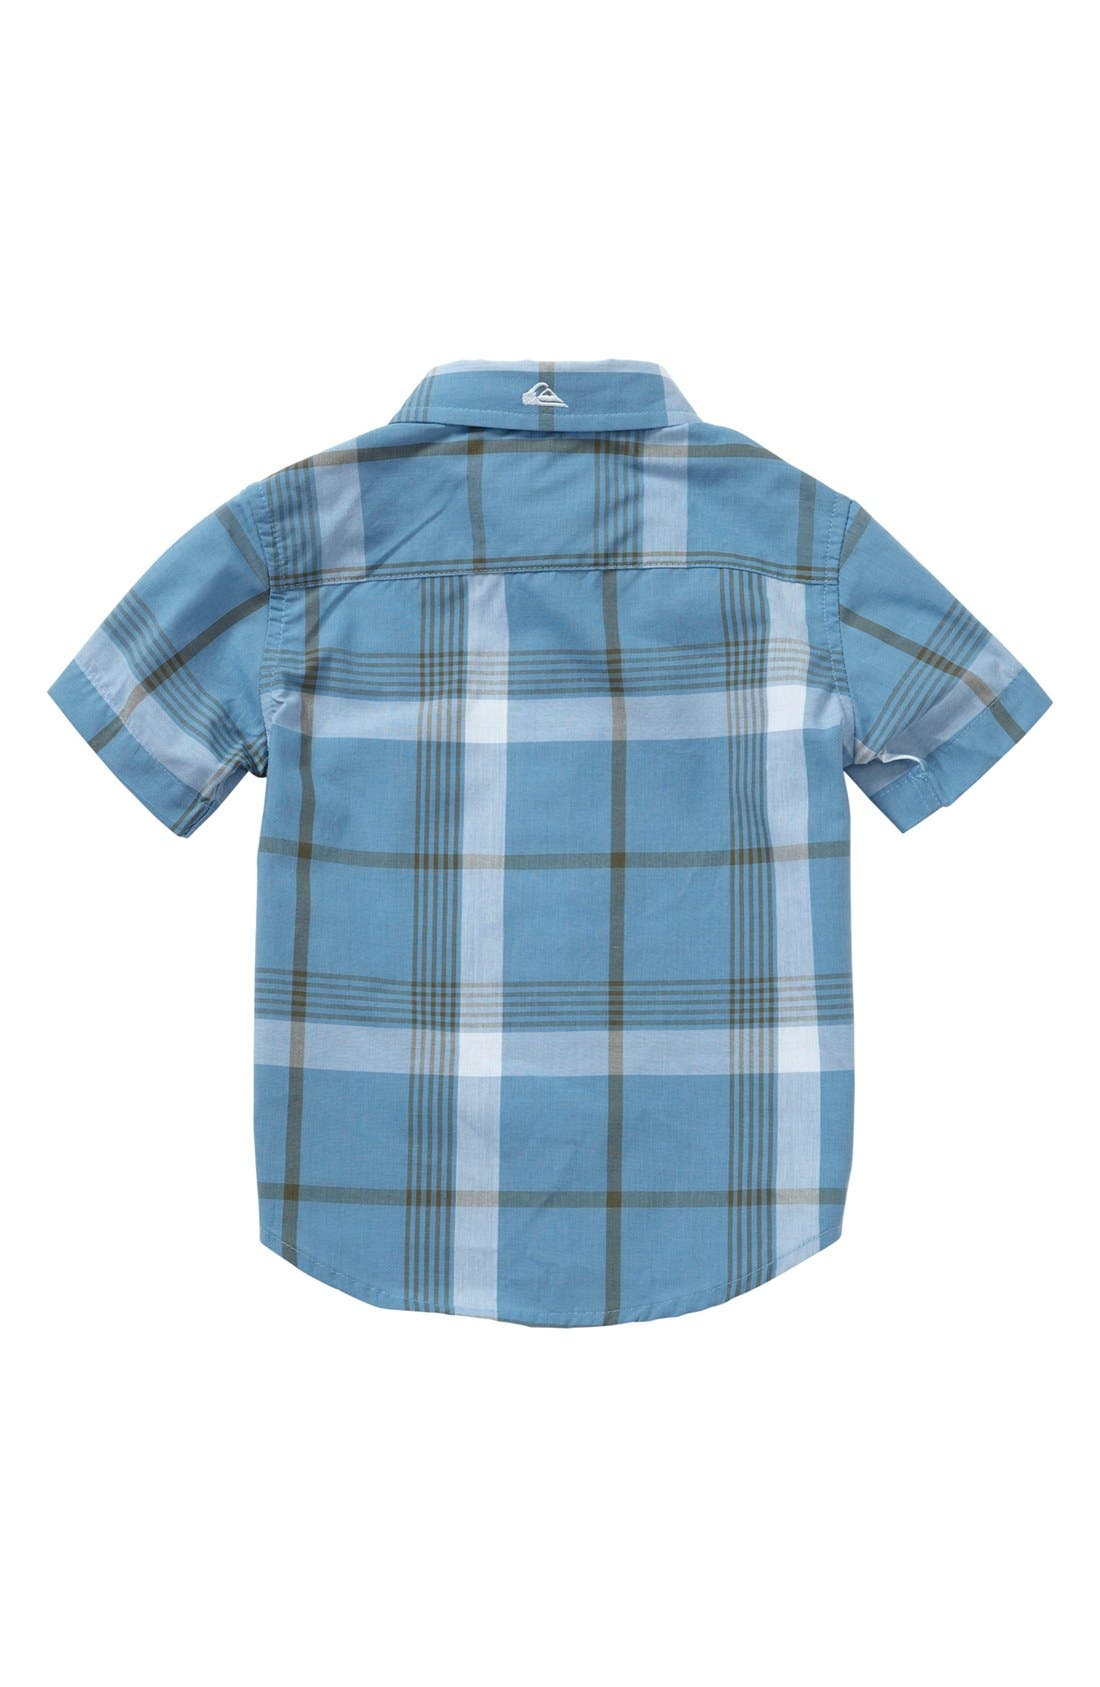 Alternate Image 2  - Quiksilver 'Jumbo Gumbo' Plaid Shirt (Baby Boys)